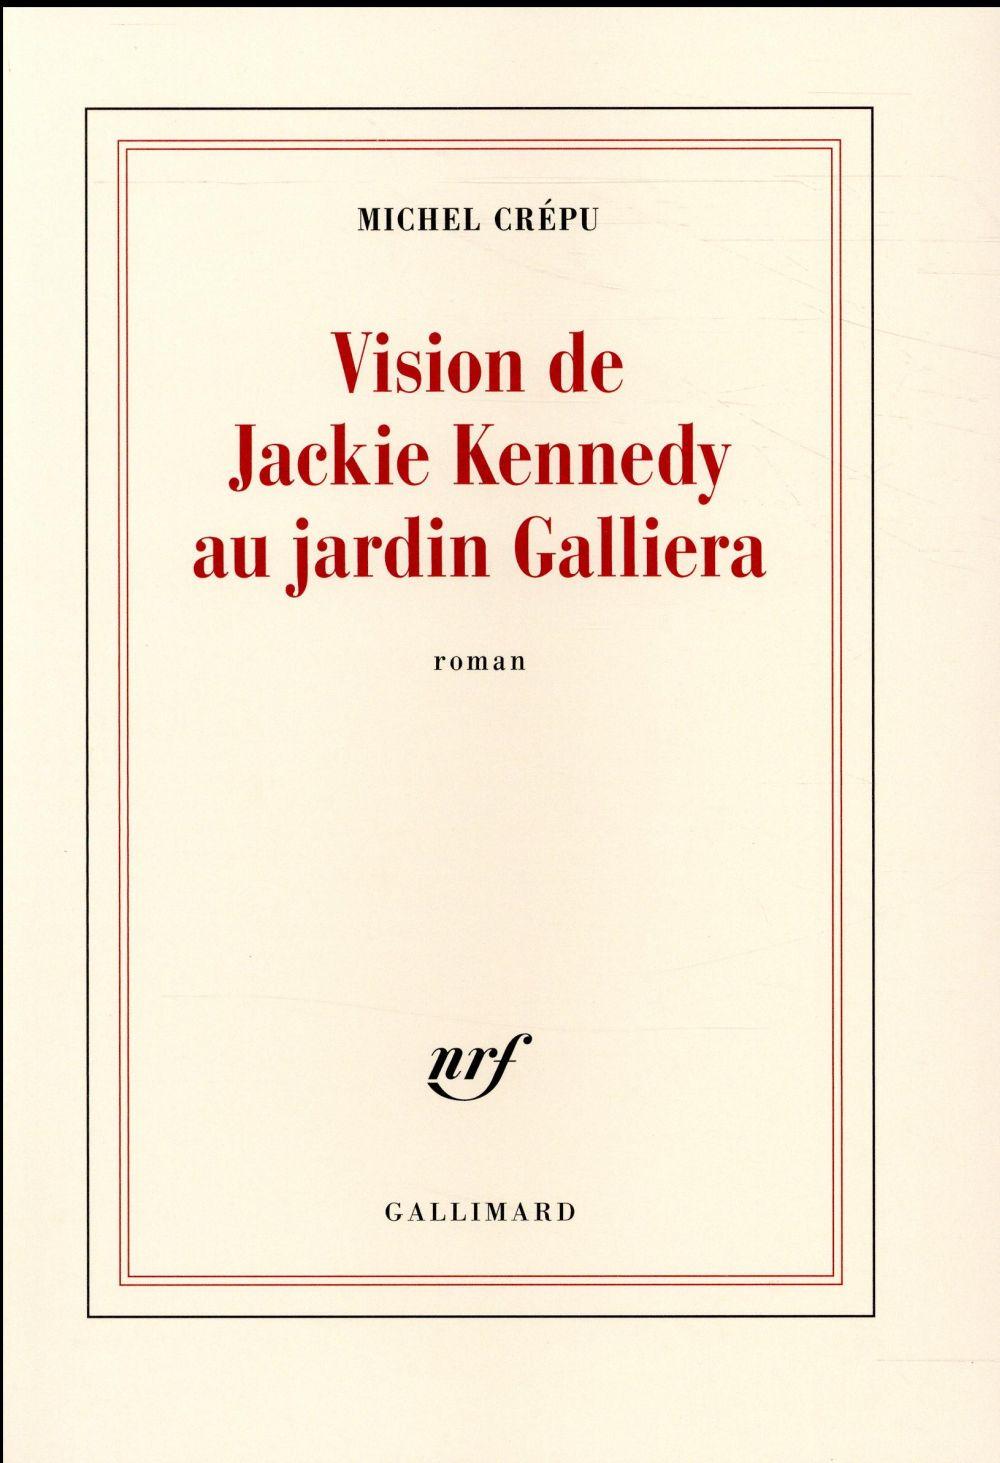 Vision de Jackie Kennedy au jardin Galliera